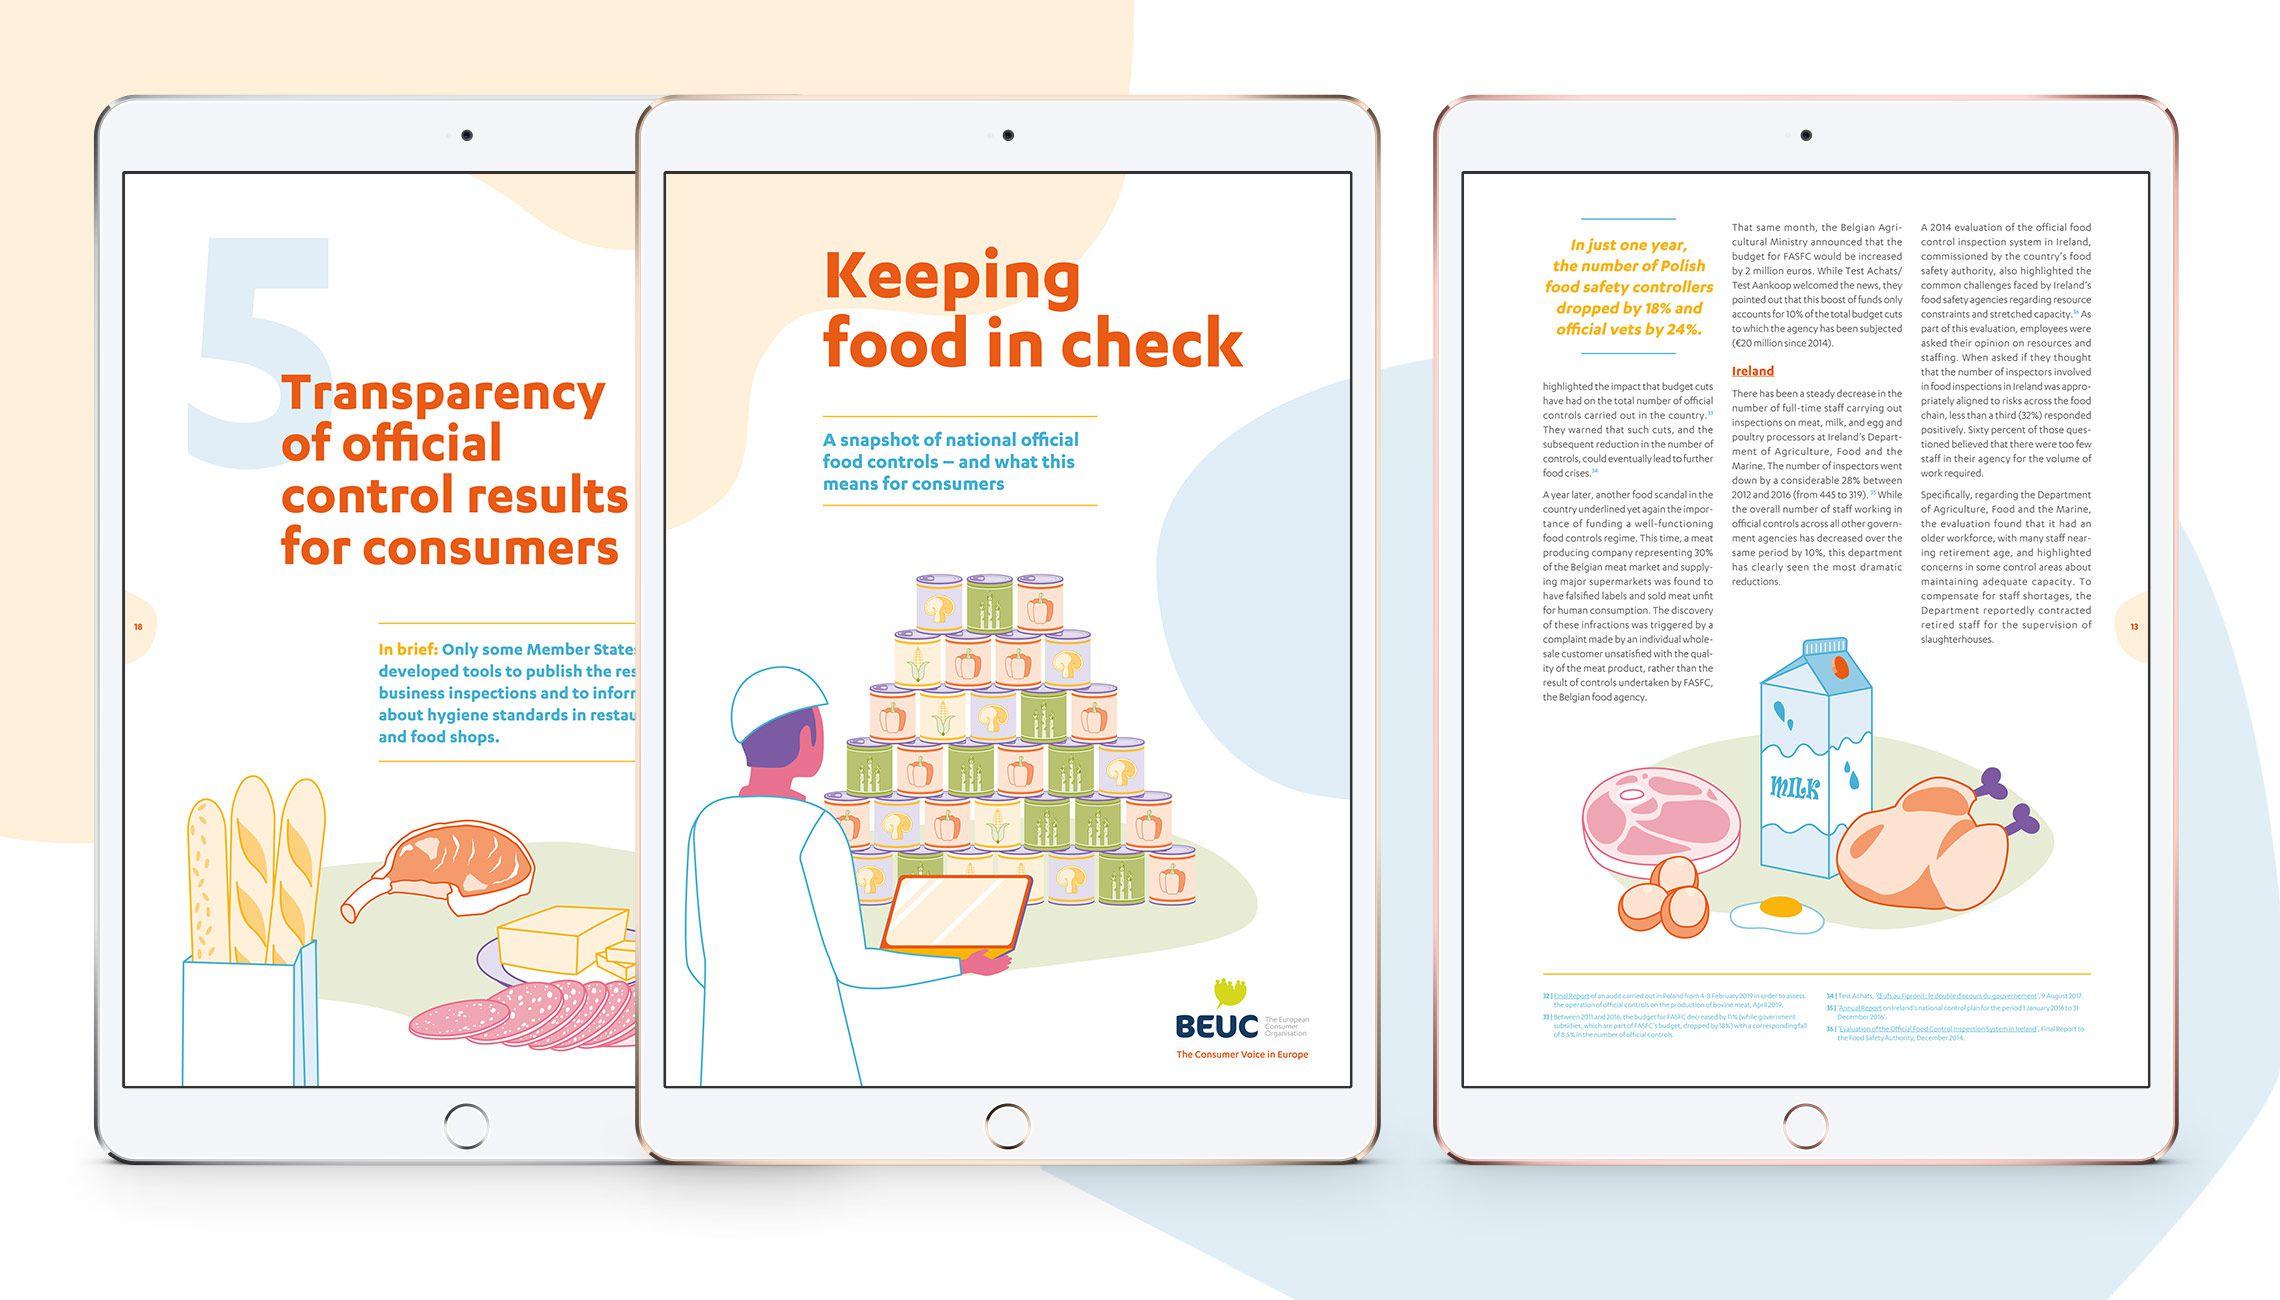 publication: EU Food controls publication - image 1